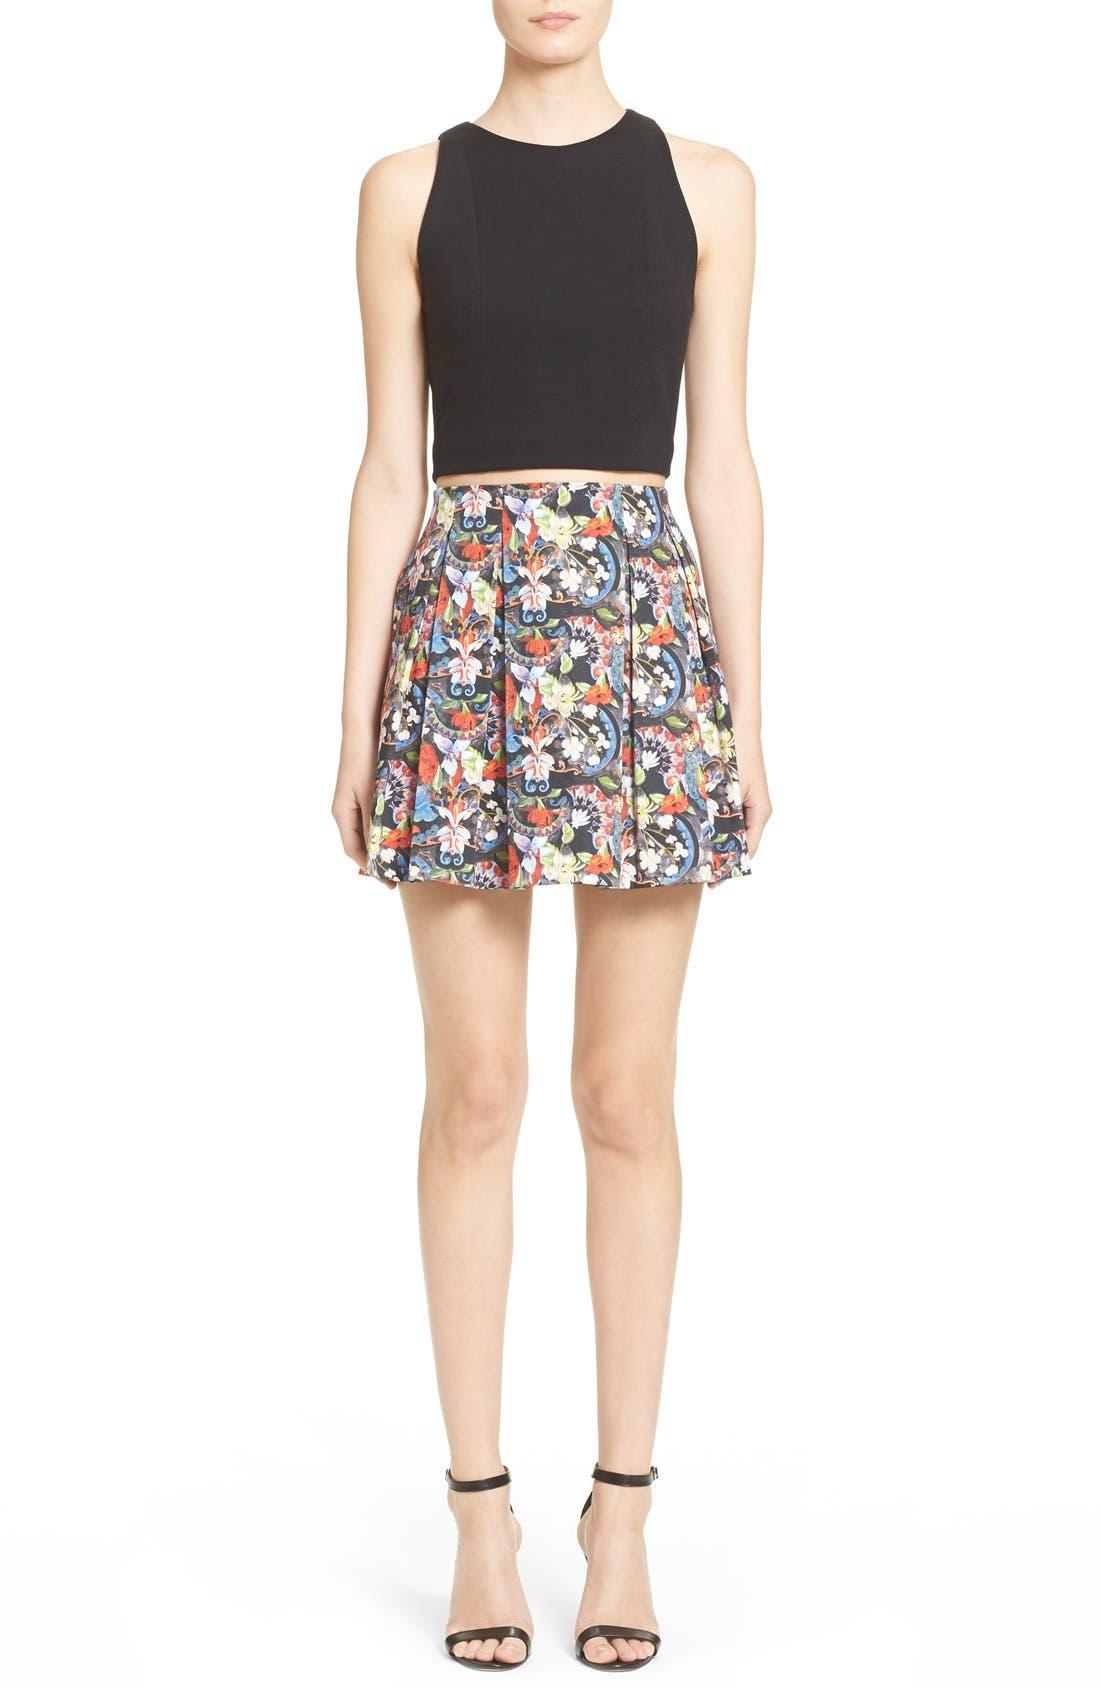 ALICE + OLIVIA, 'Parson' Floral Print Pleated Miniskirt, Alternate thumbnail 6, color, 605